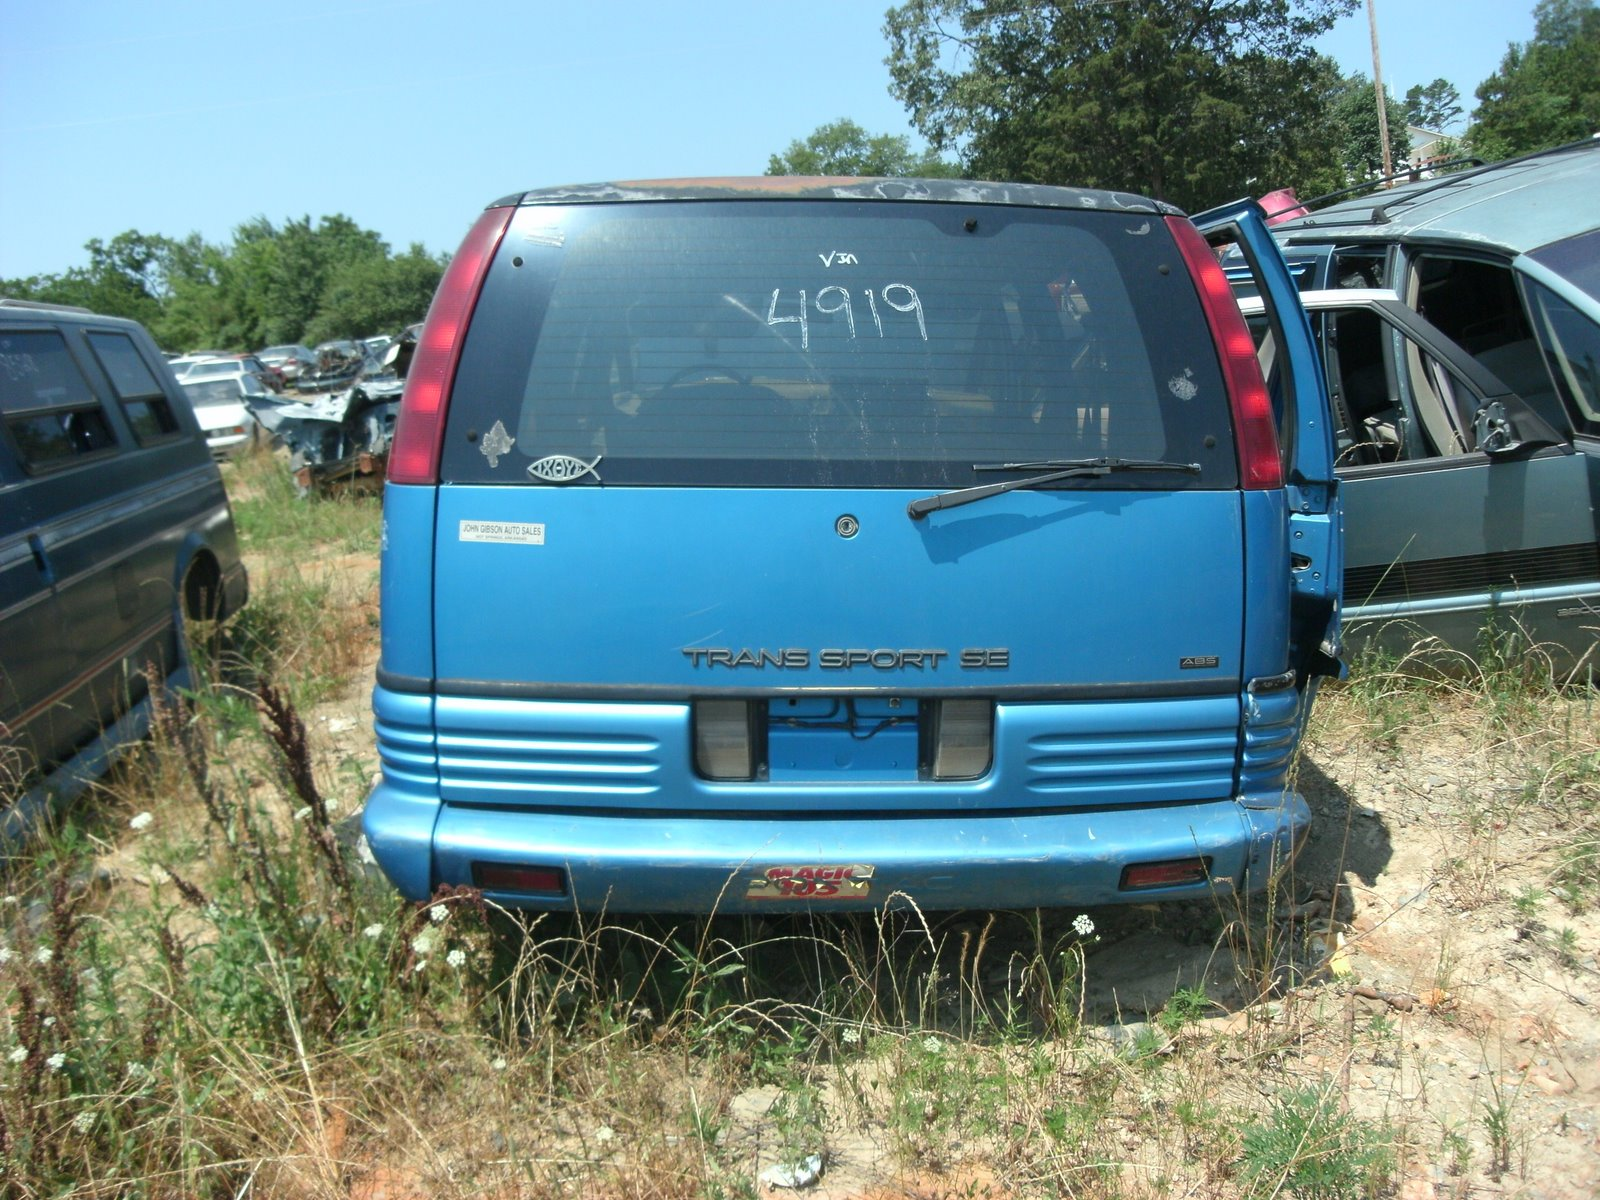 Gedc on 1991 Dodge Dakota Salvage